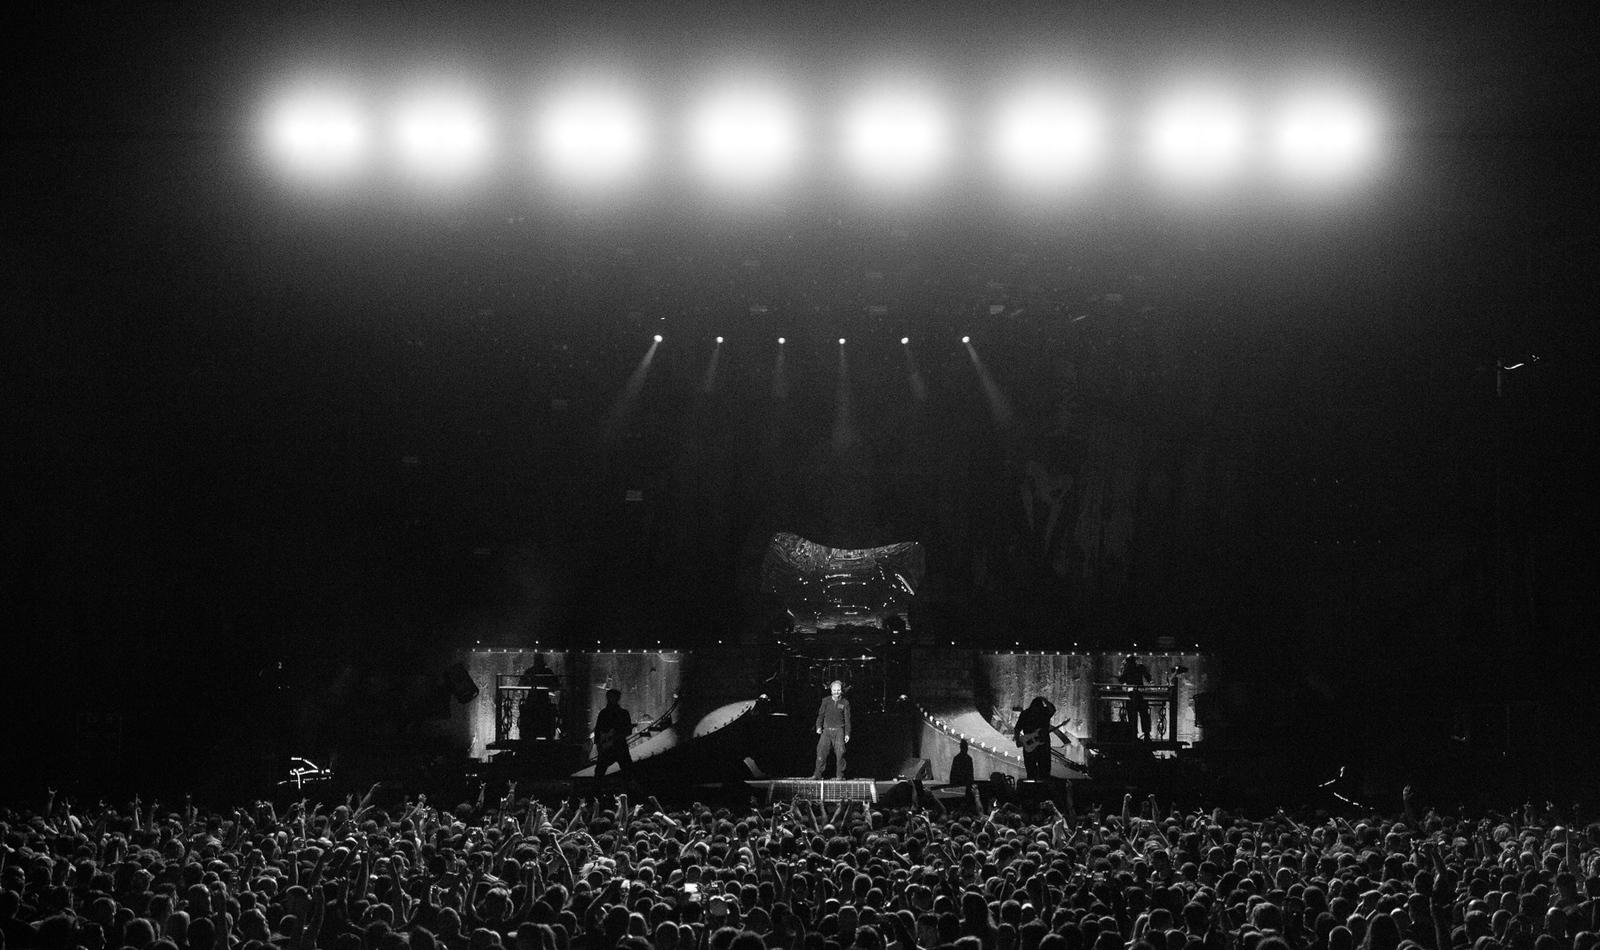 Slipknot at Knotfest 2015